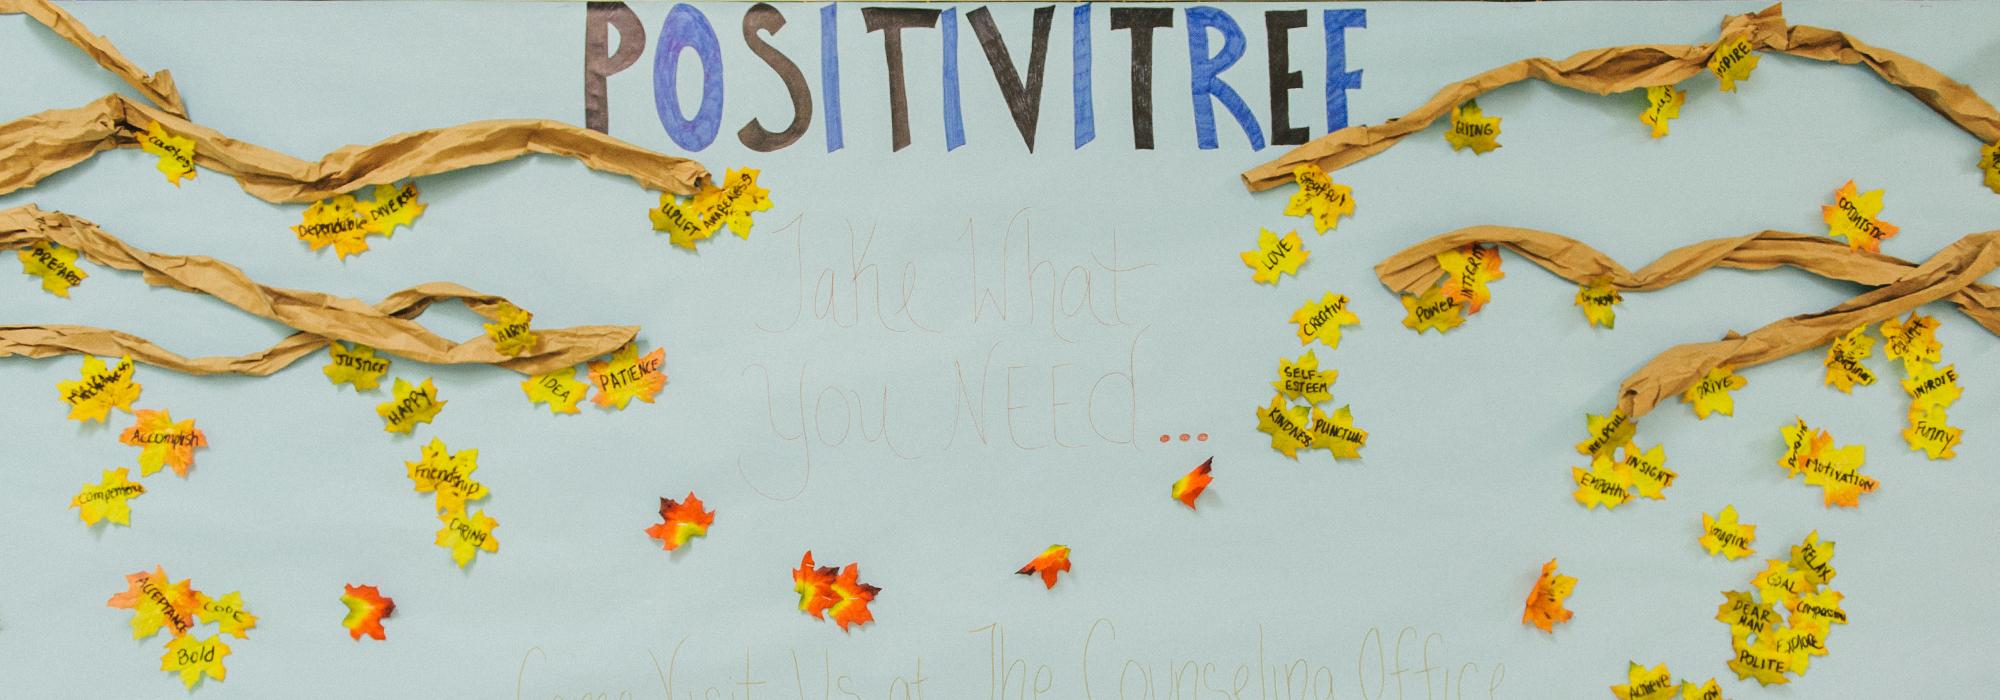 Positivitree